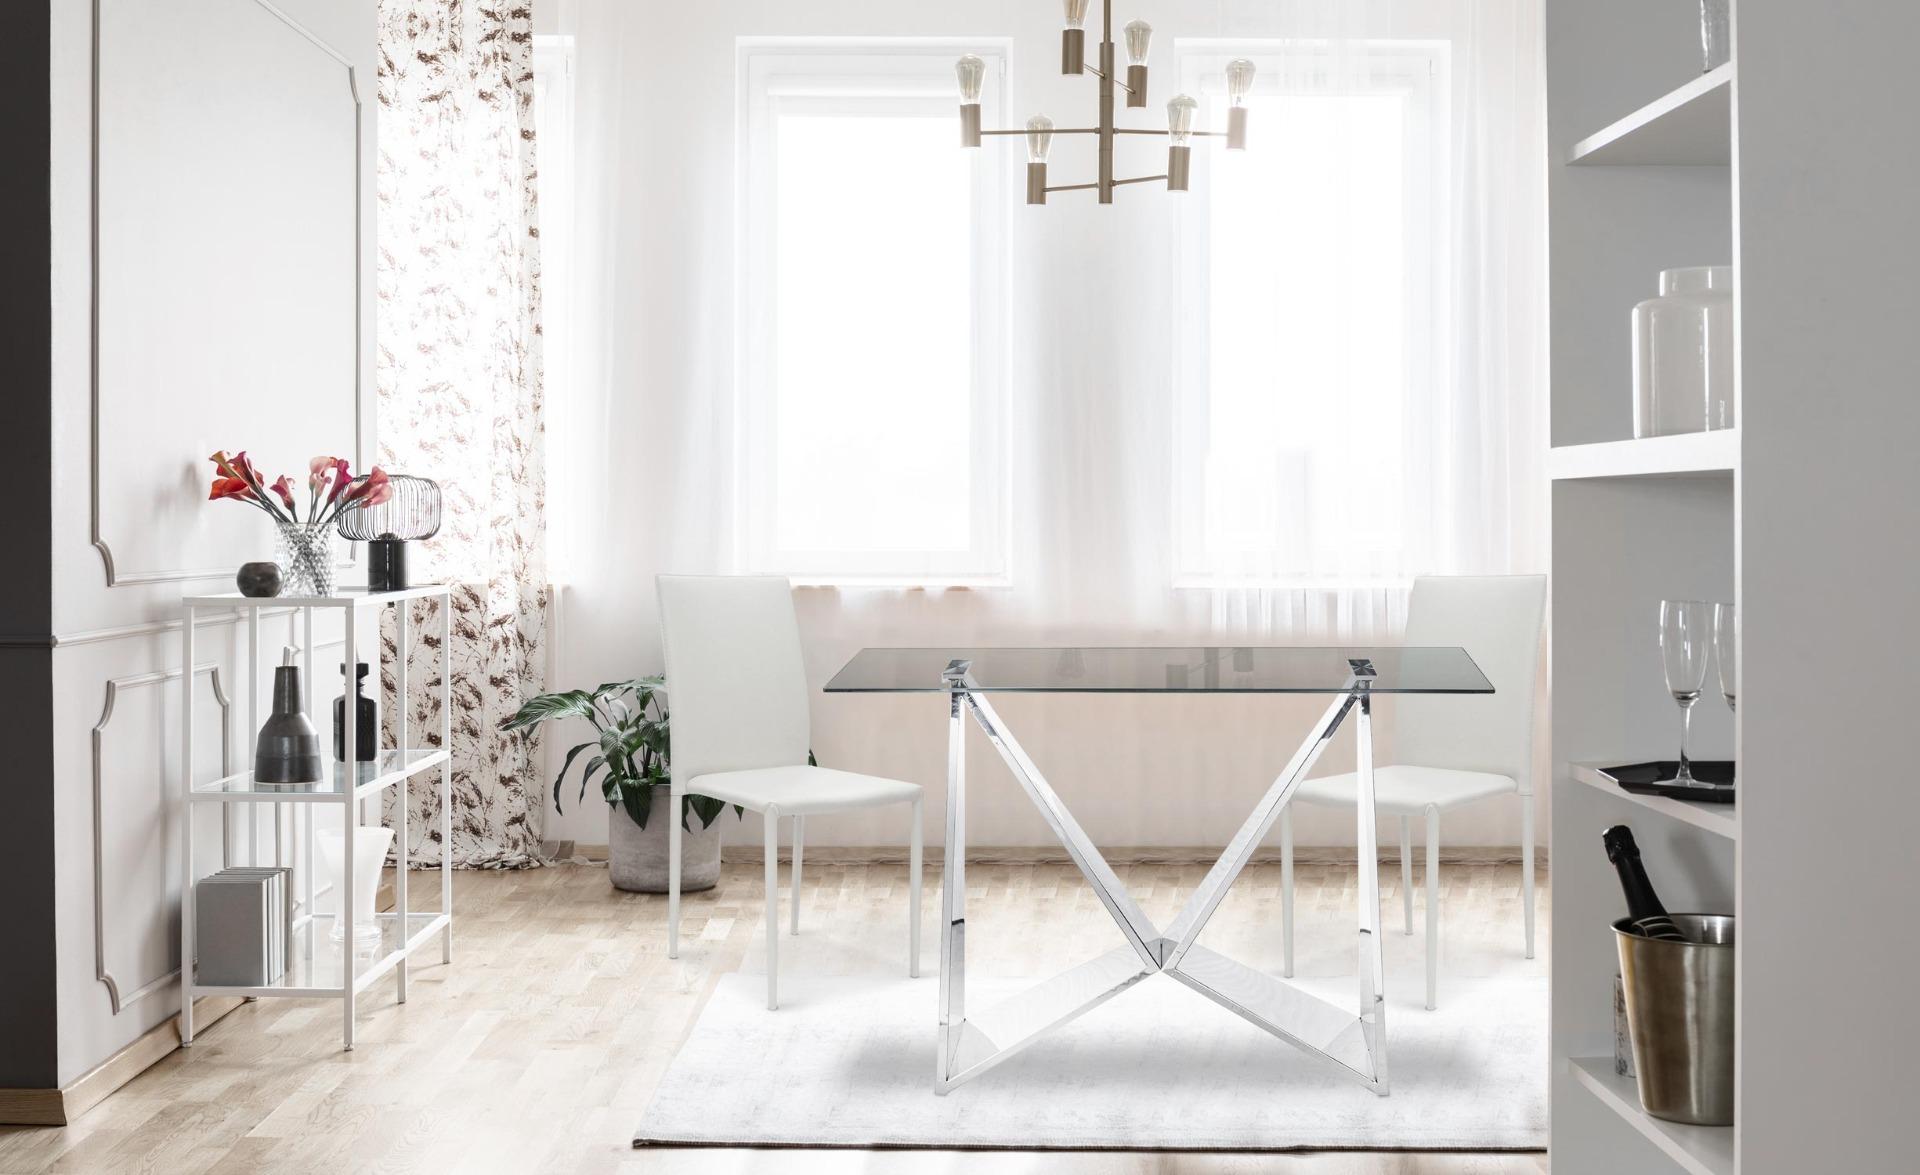 Lot de 30 chaises empilables Modan Simili (P.U) Blanc